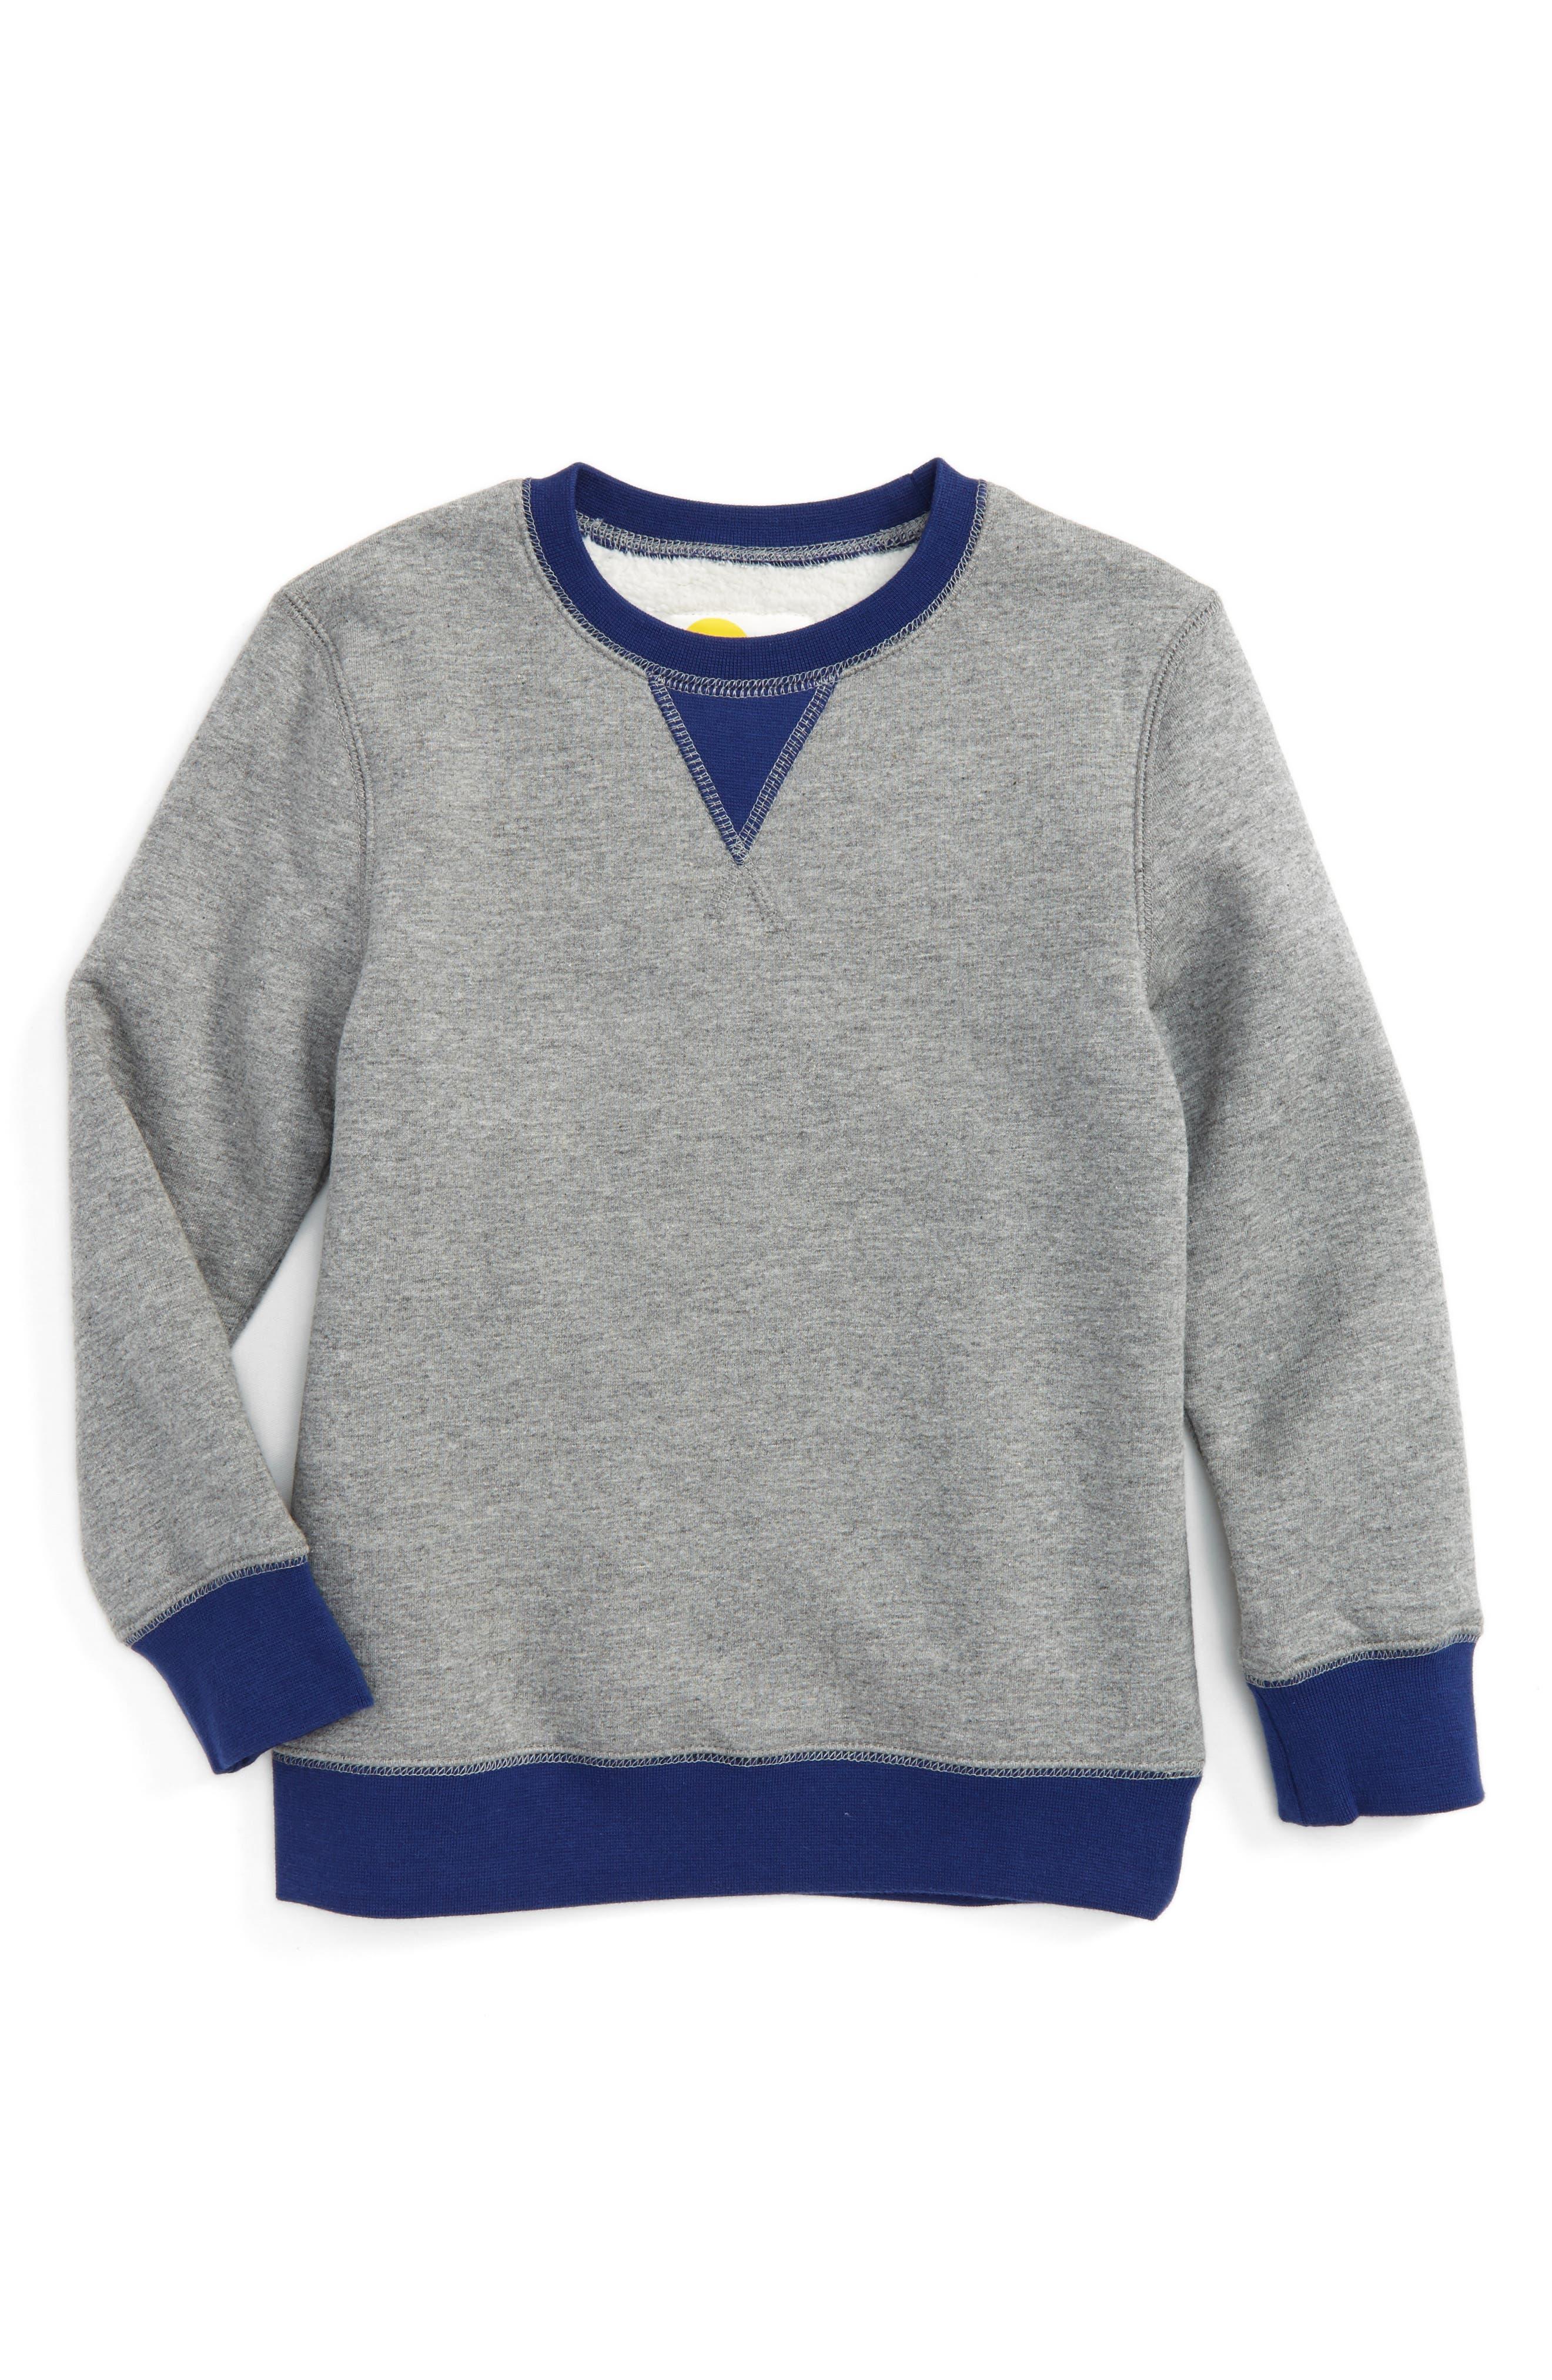 Shaggy Lined Sweatshirt,                             Main thumbnail 1, color,                             062